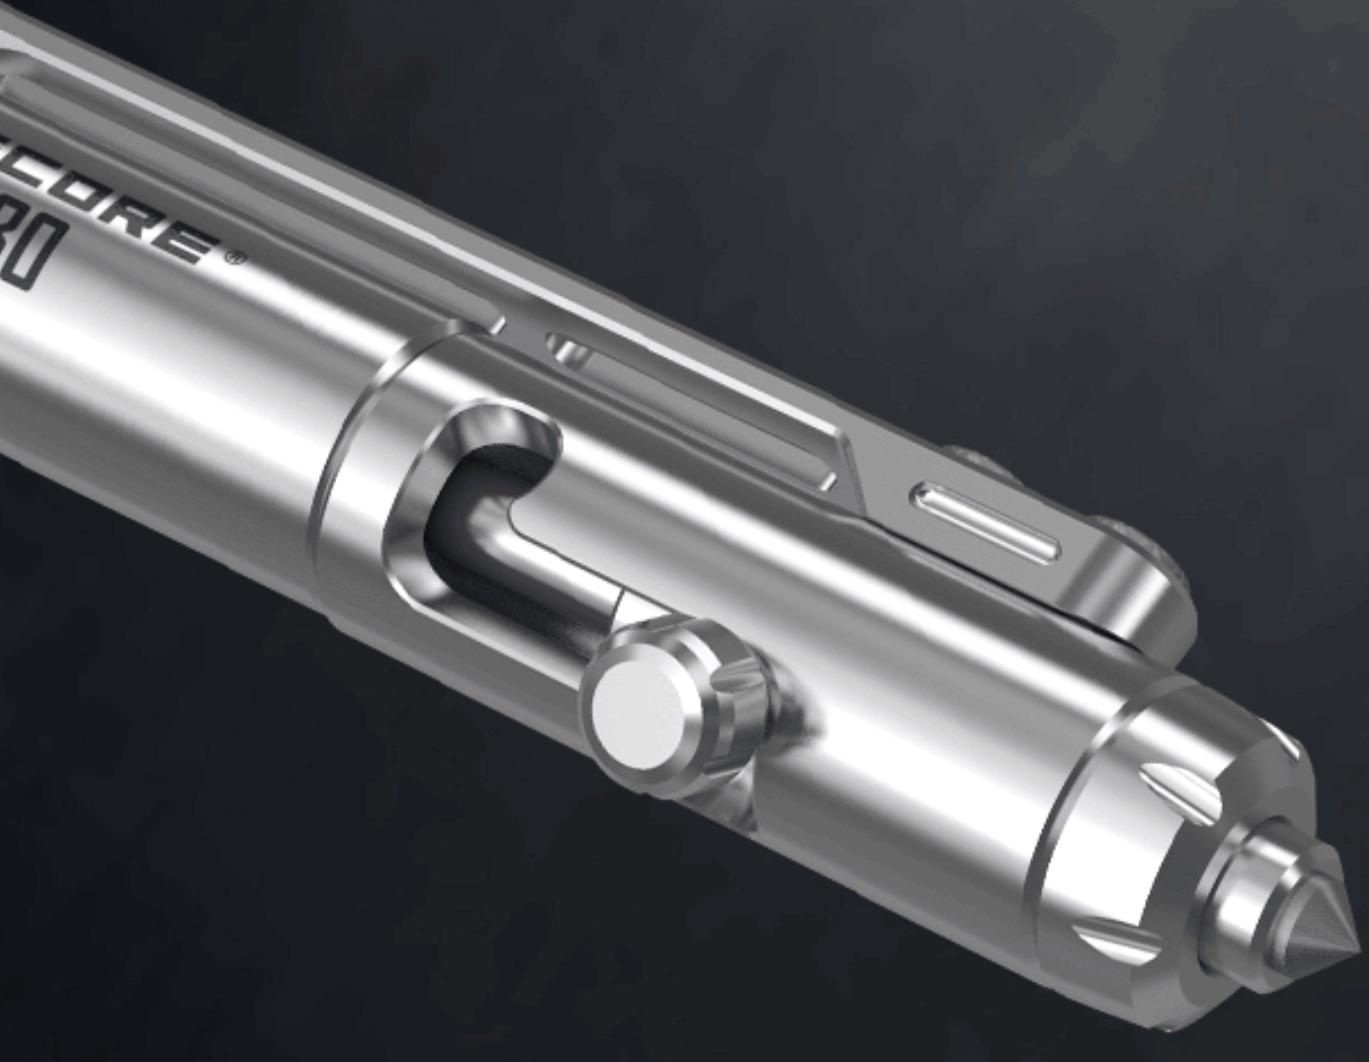 nitecore-ntp30-titanium-tactical-pen-2